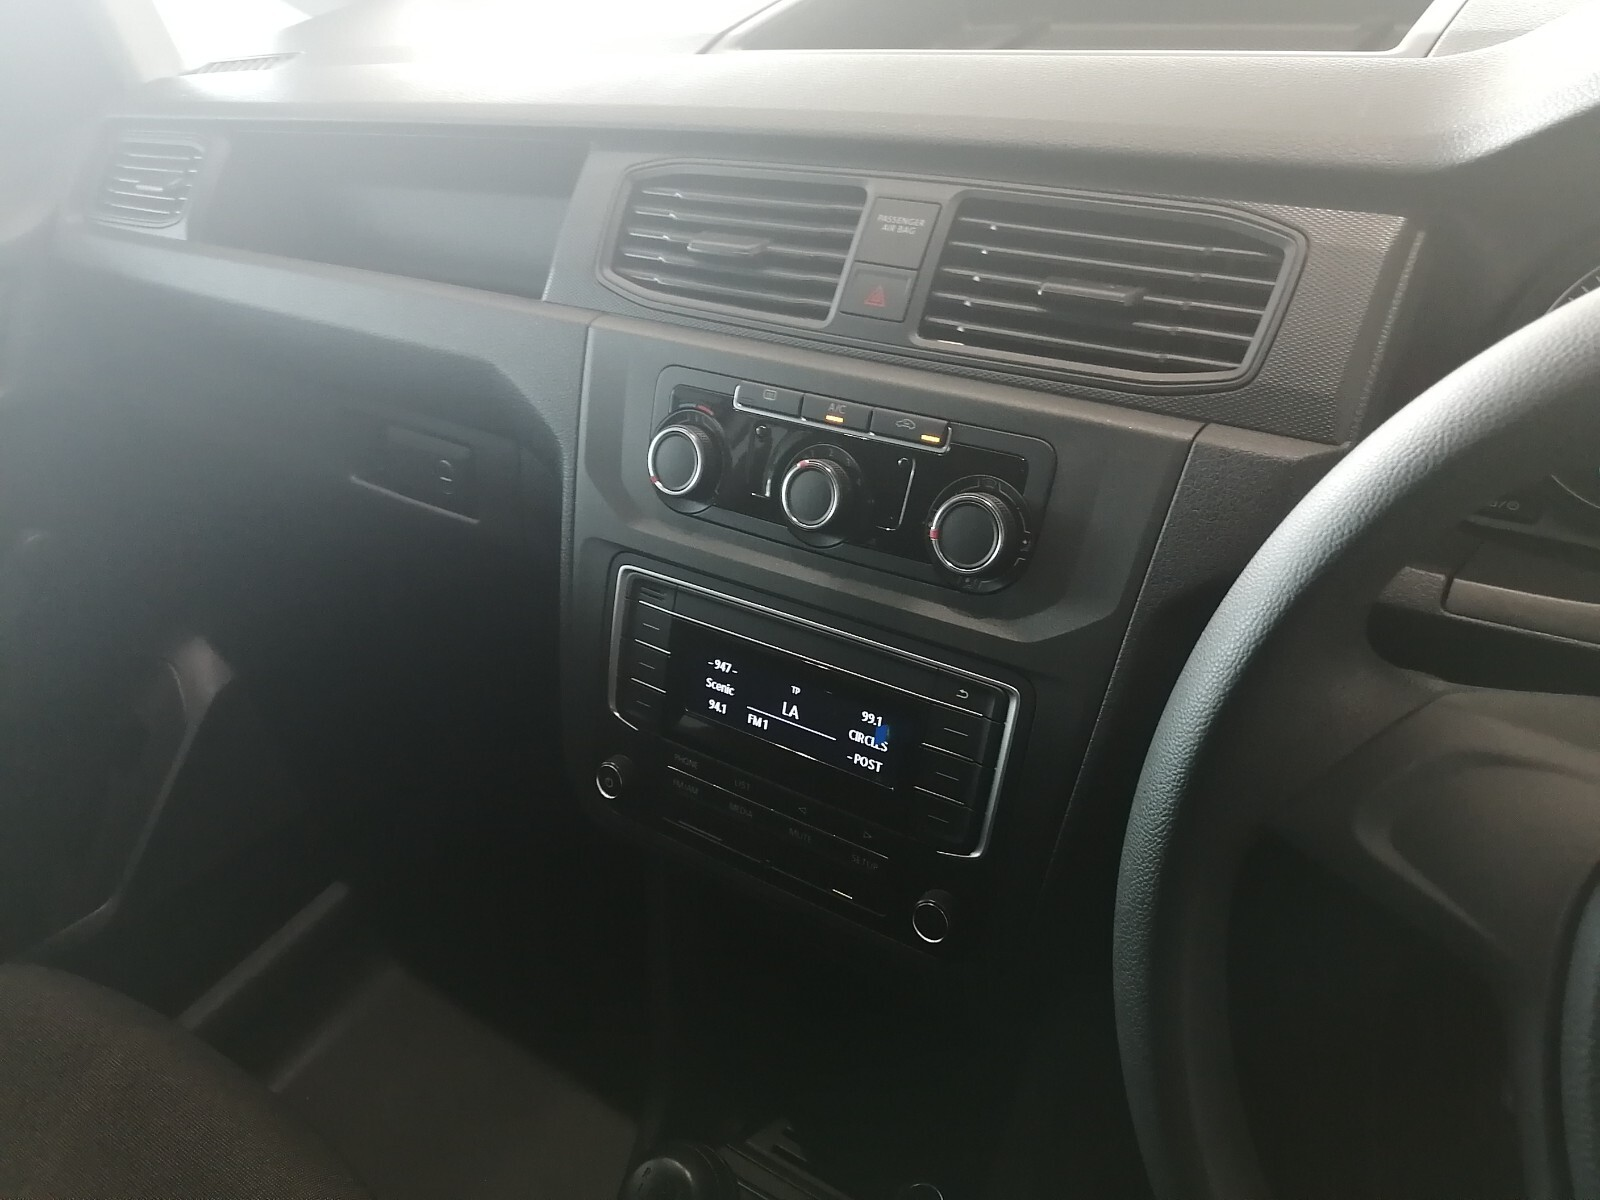 VOLKSWAGEN CREWBUS 1.6i  (7 SEAT) Benoni 7326169